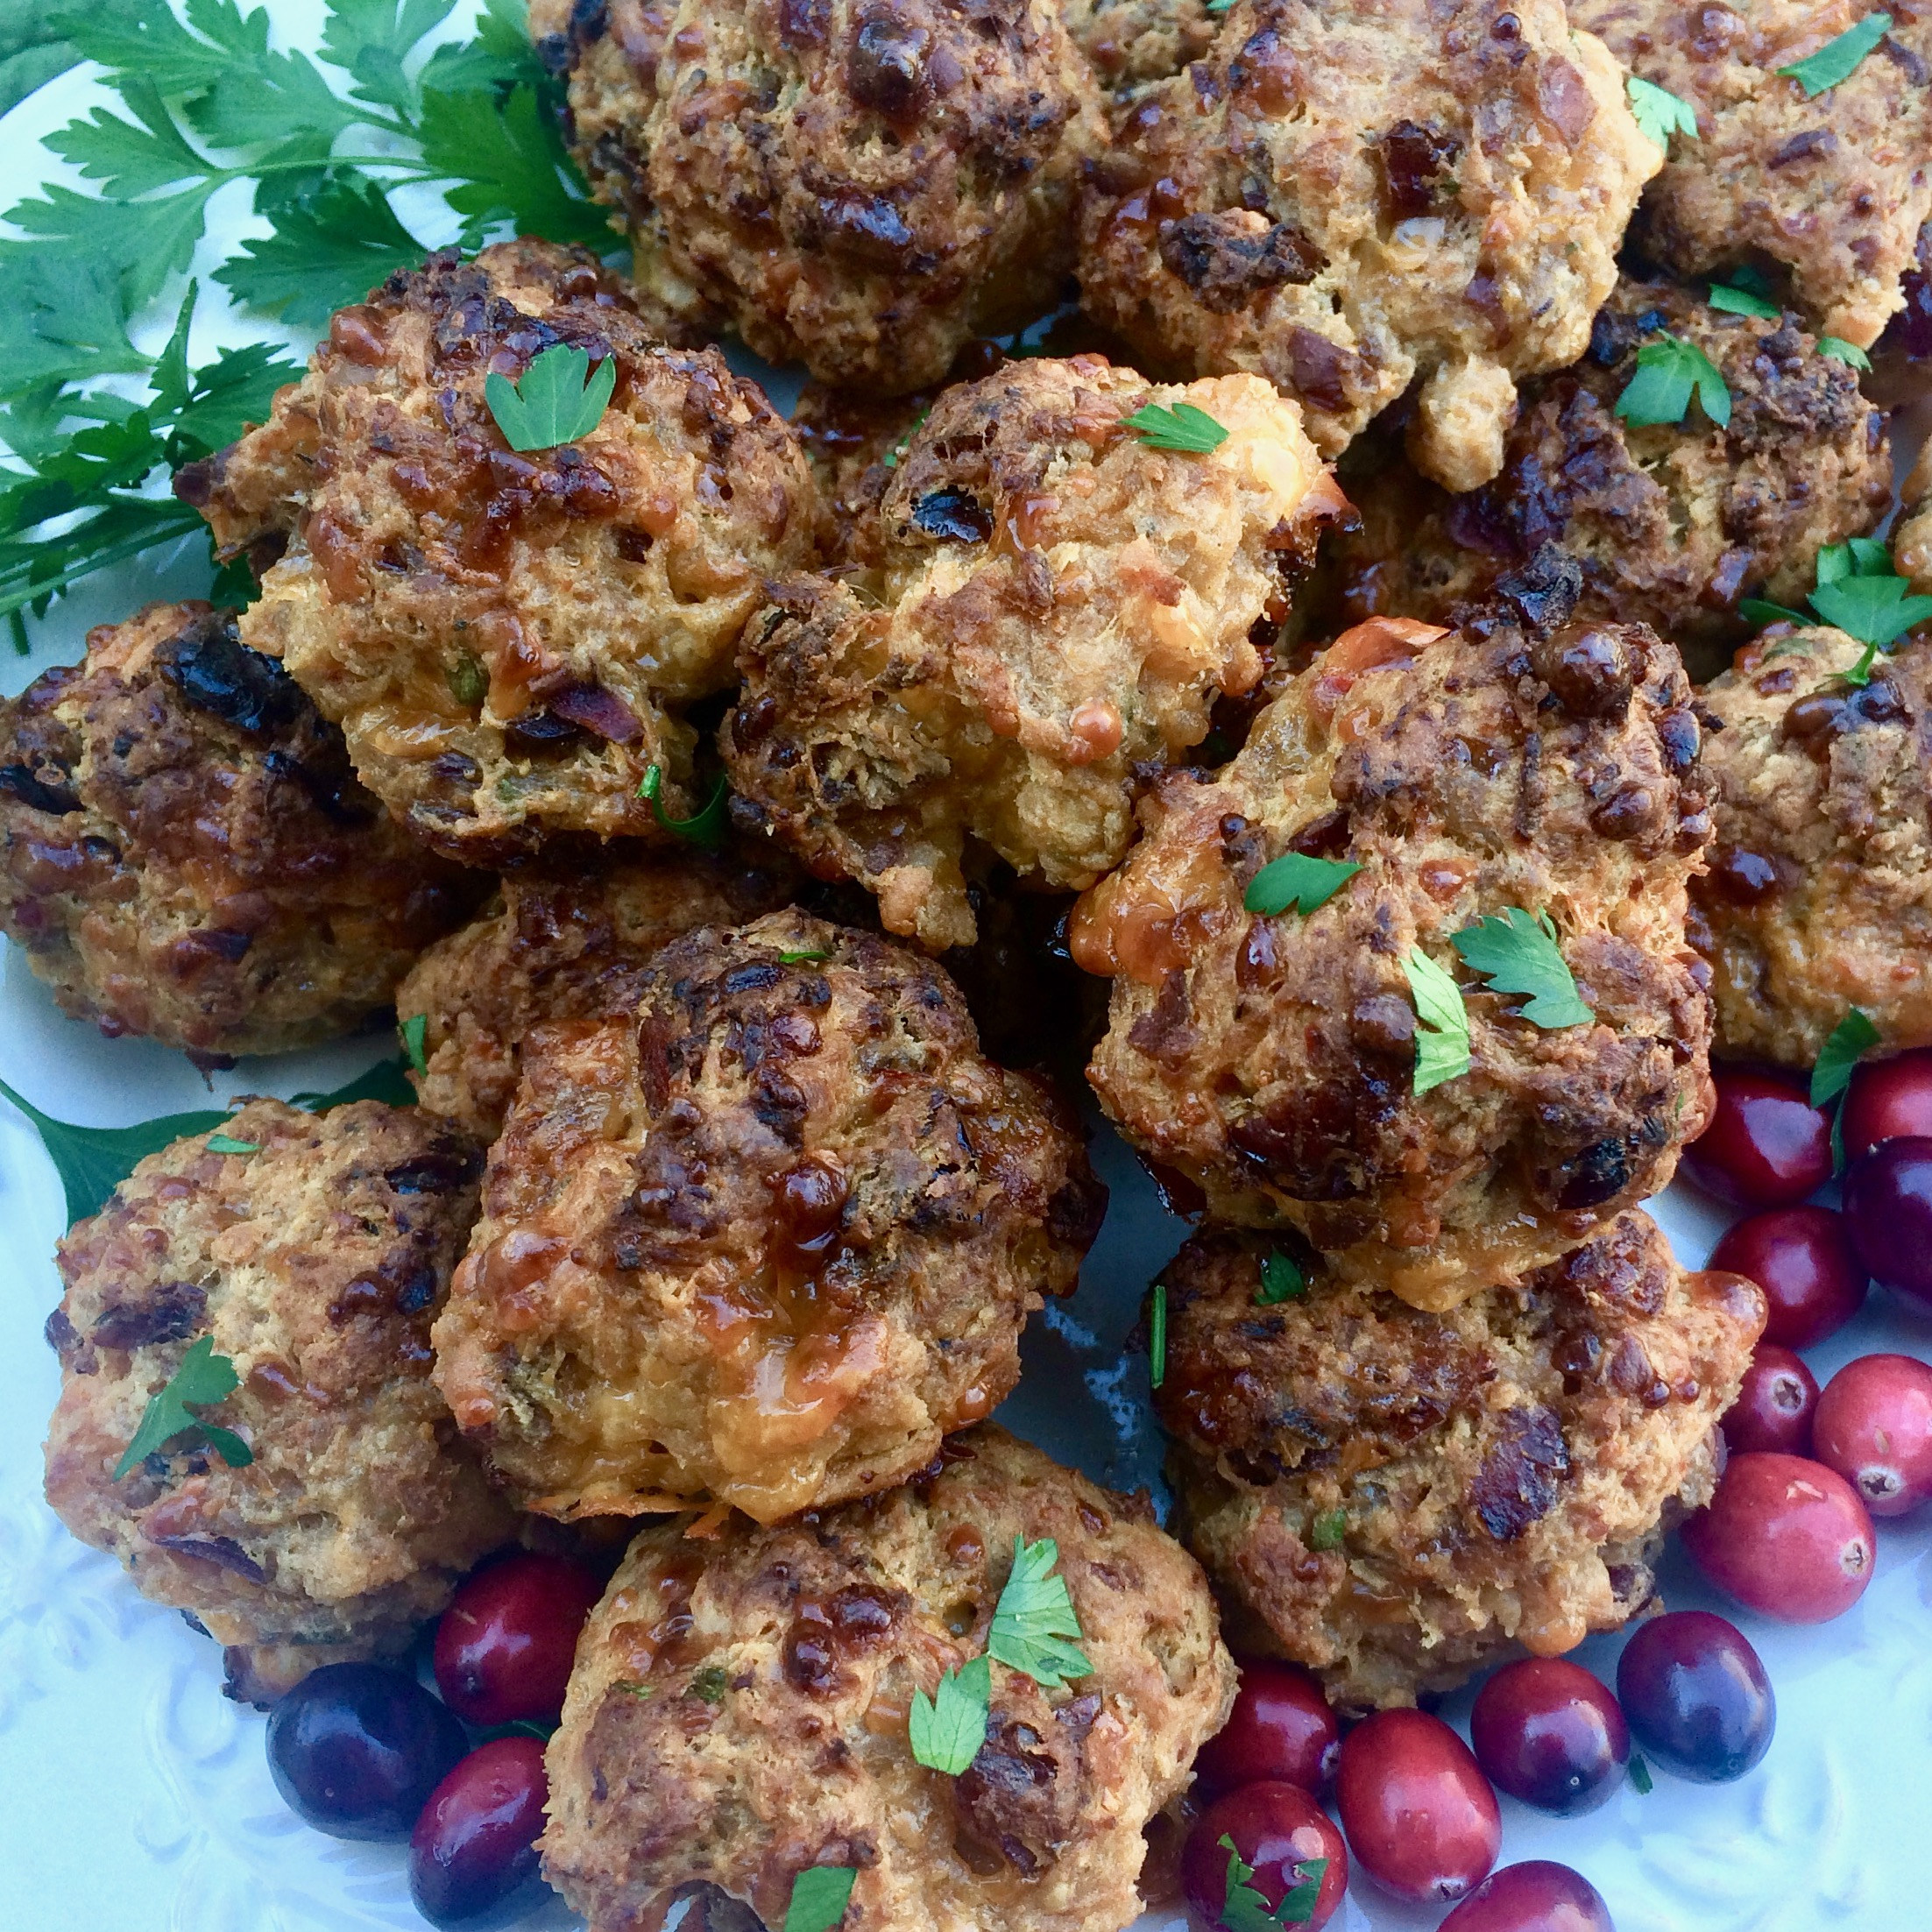 Spicy Cranberry Sausage Balls